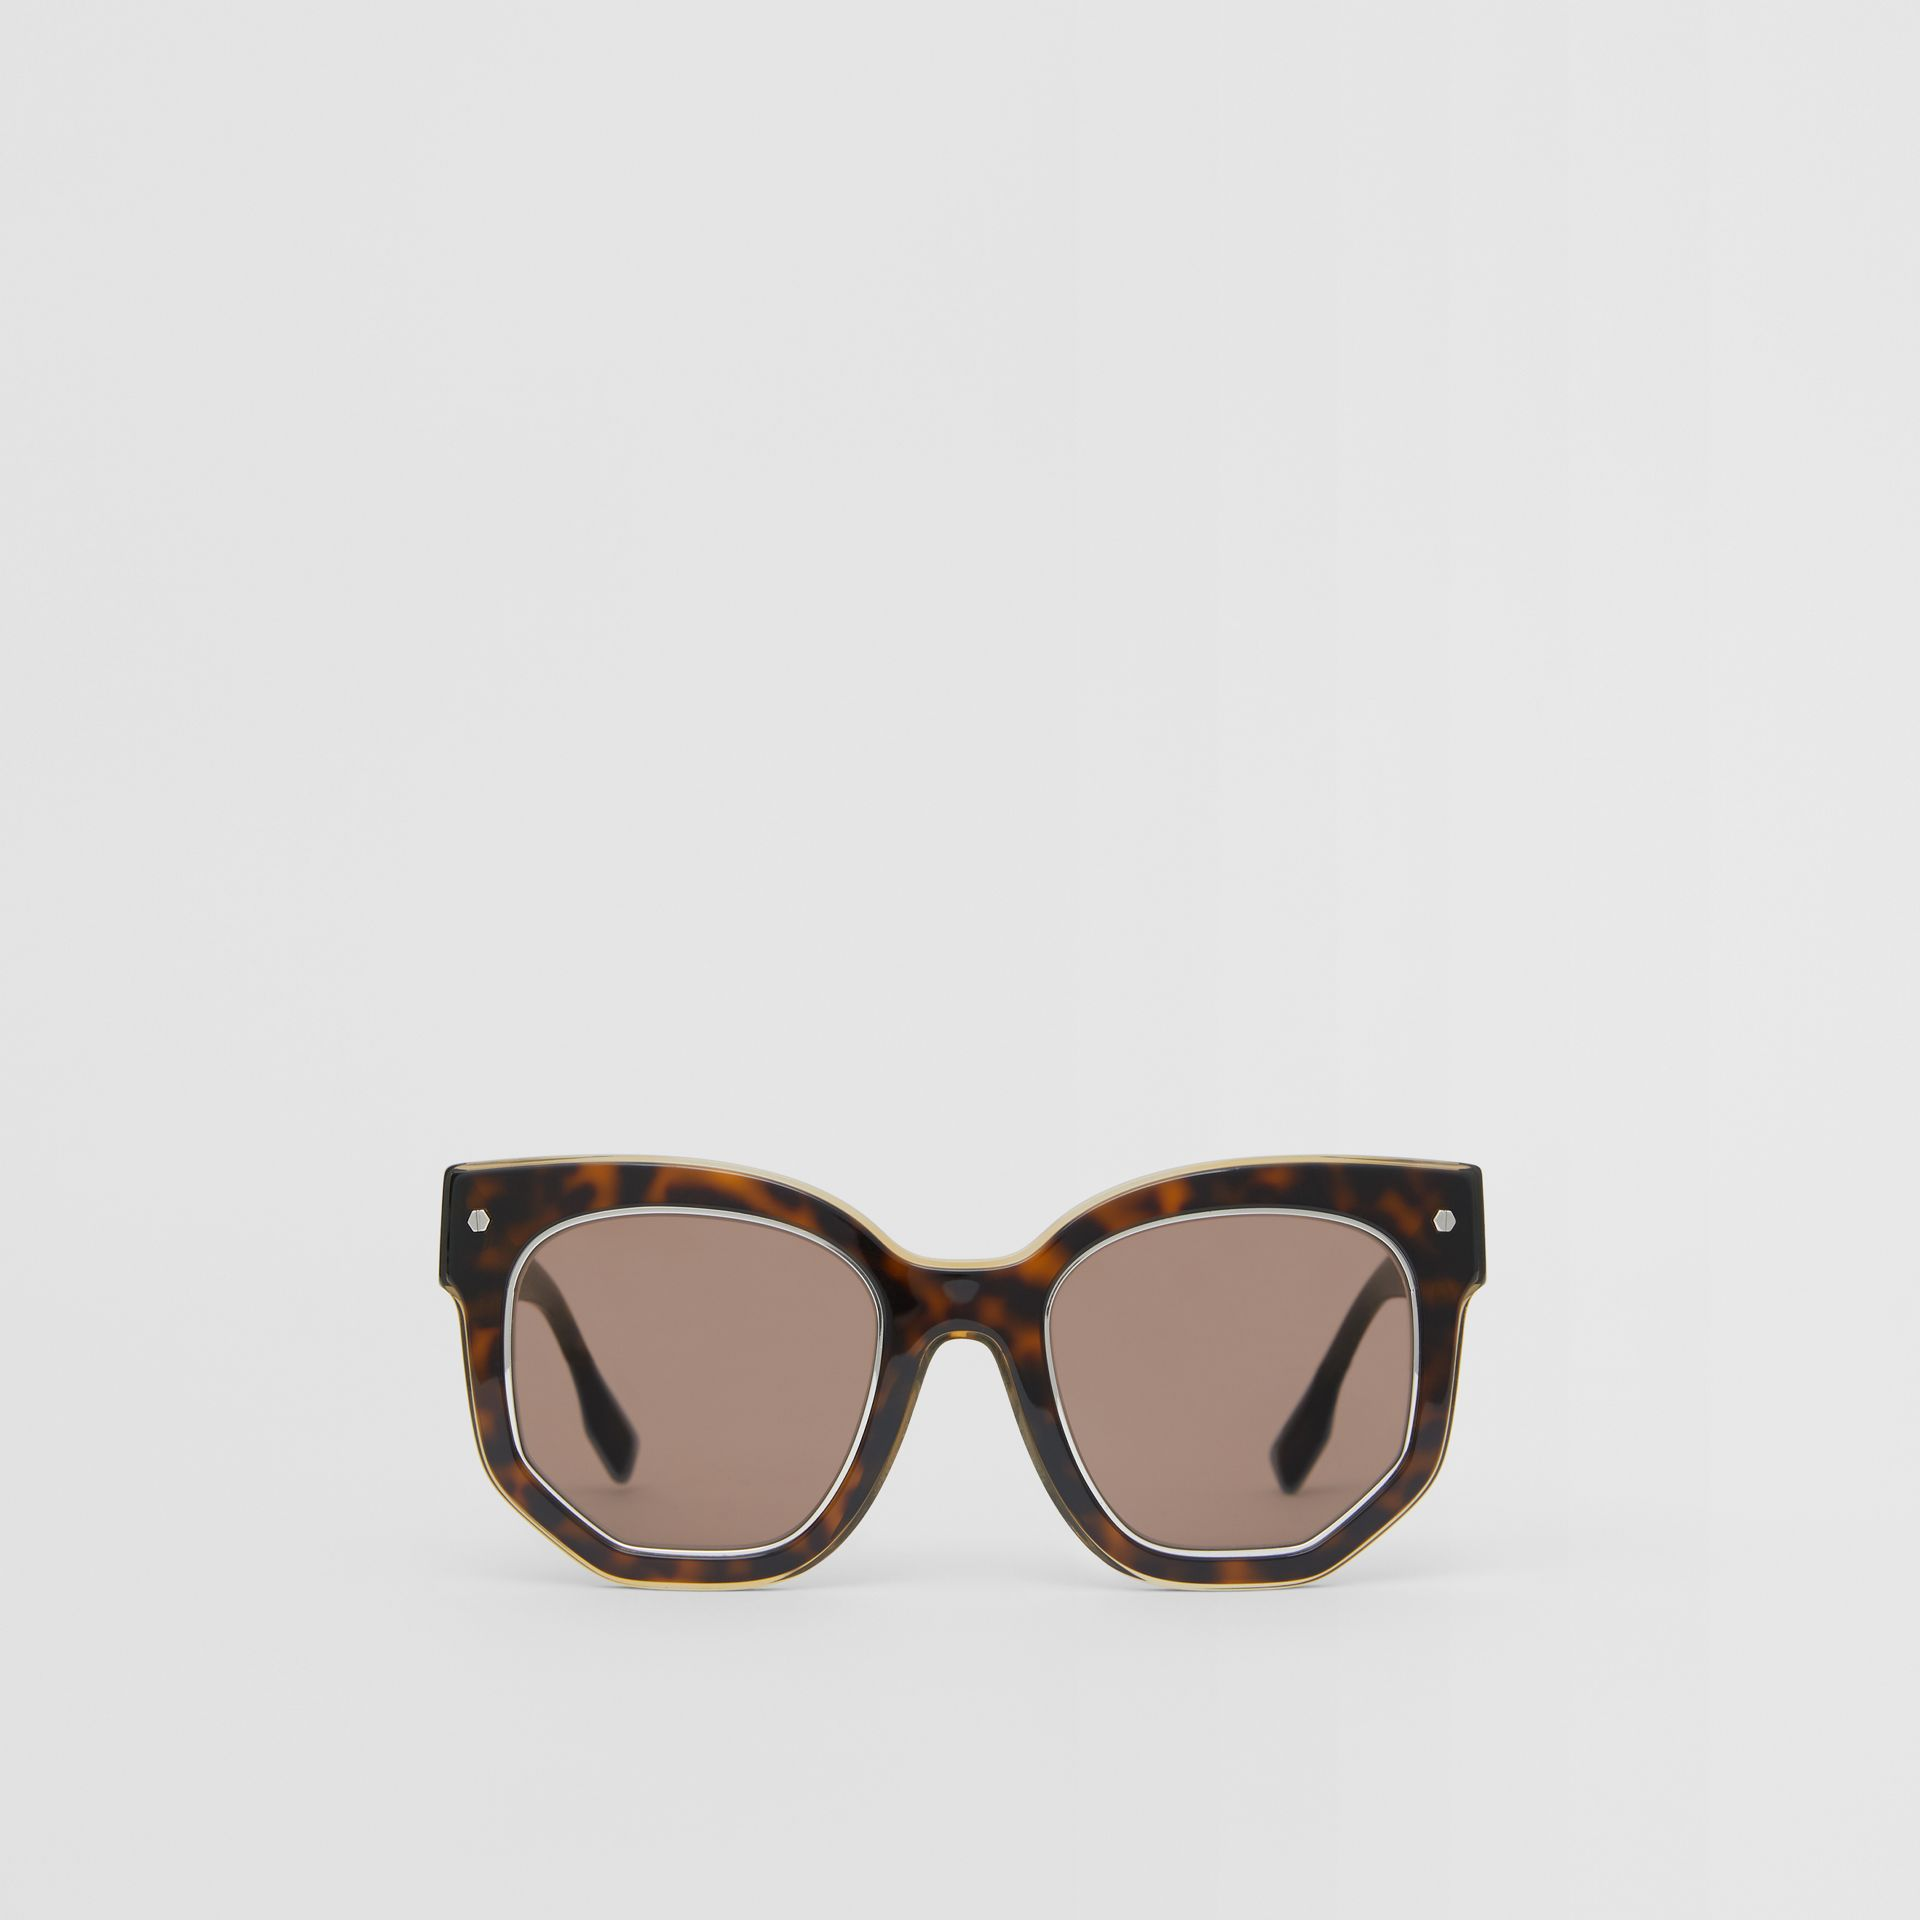 Geometric Frame Sunglasses in Tortoiseshell - Women | Burberry United Kingdom - gallery image 0